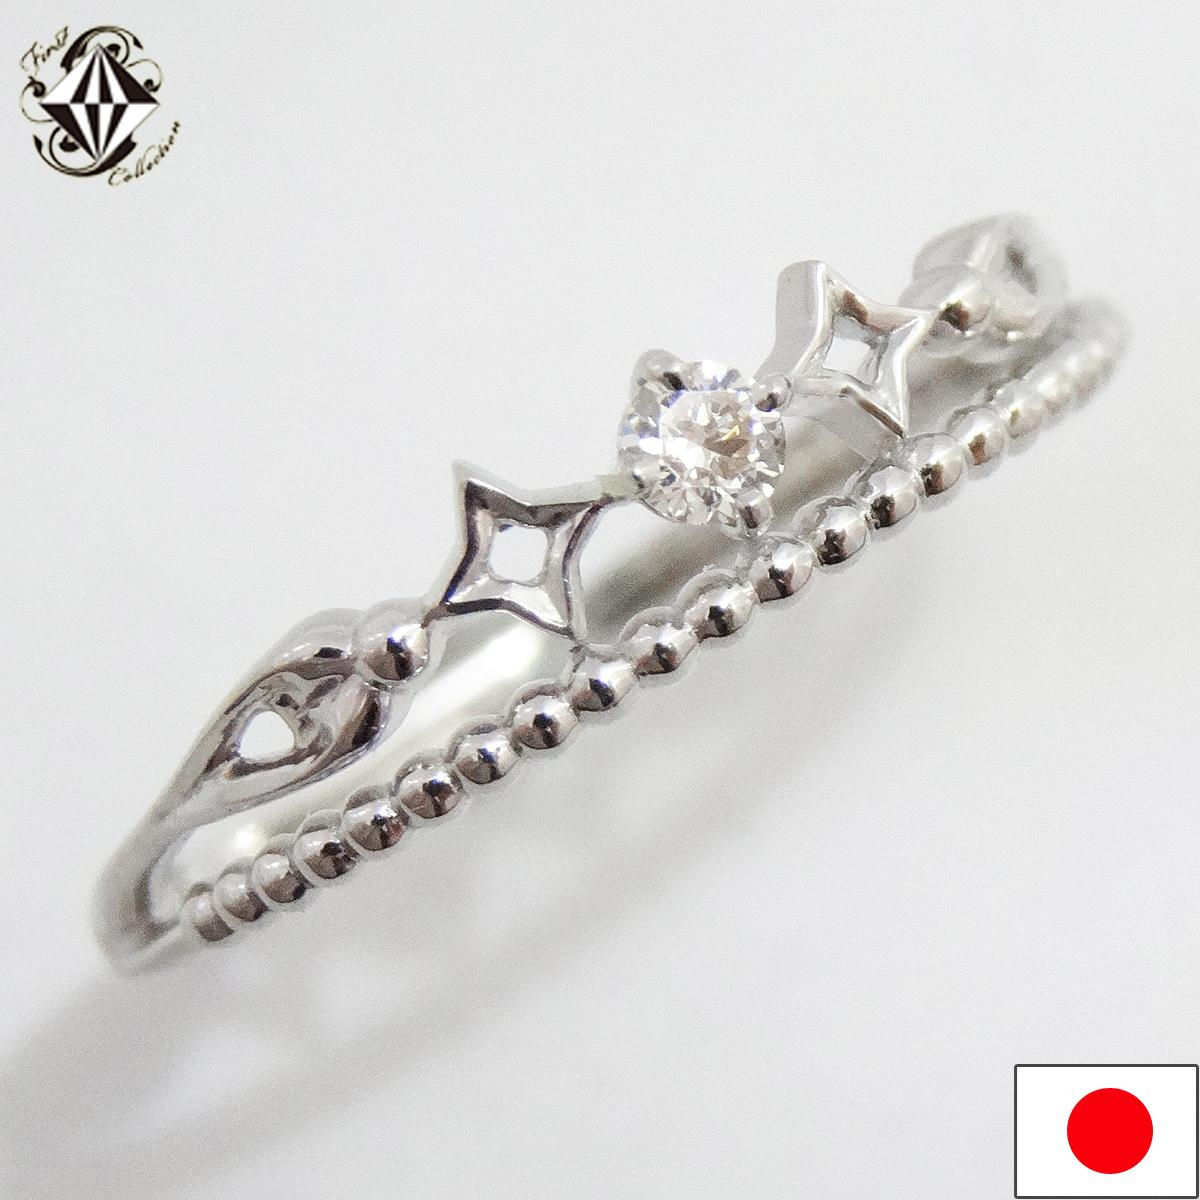 K18 リング 指輪 天然 ダイヤモンド ピンキーリング 18金 ホワイトゴールド 普段使い 高品質 ティアラモチーフ